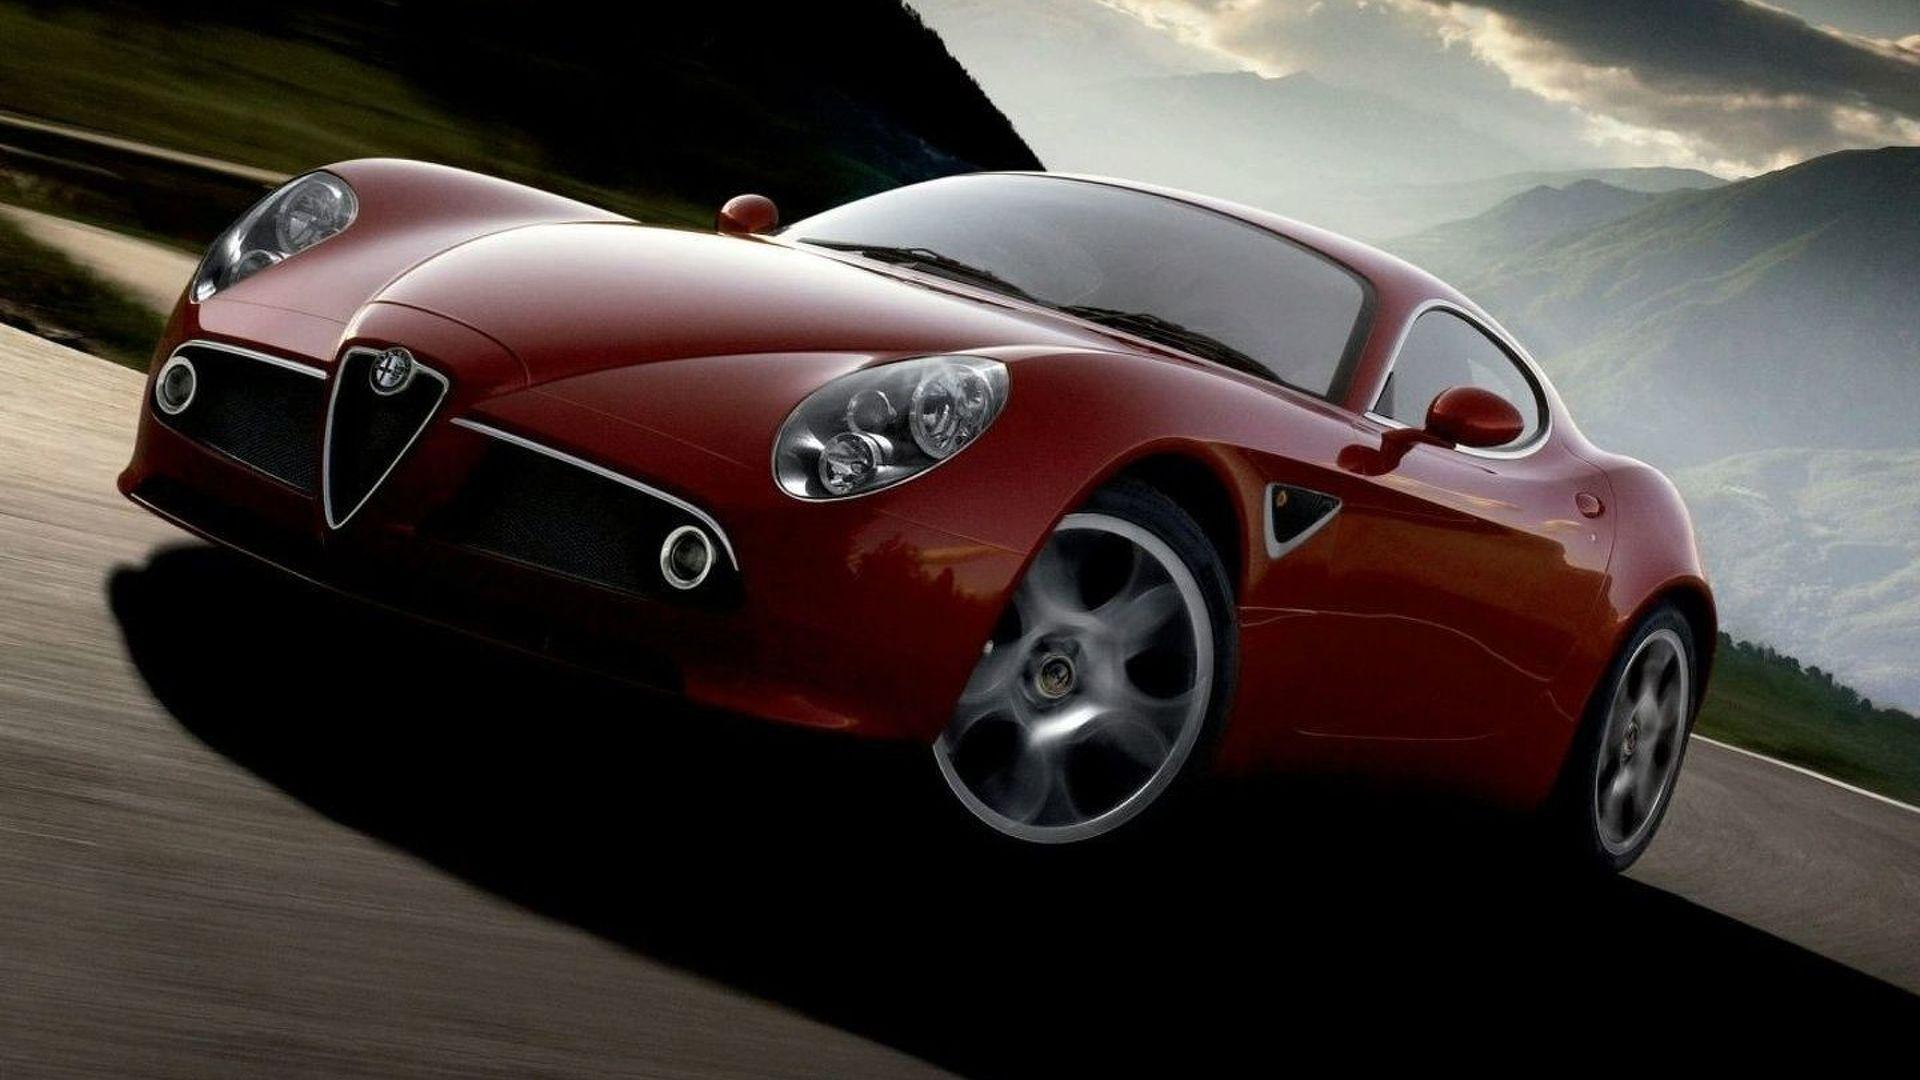 Alfa Romeo 8C Competizione GTA Rumoured to be in the Works